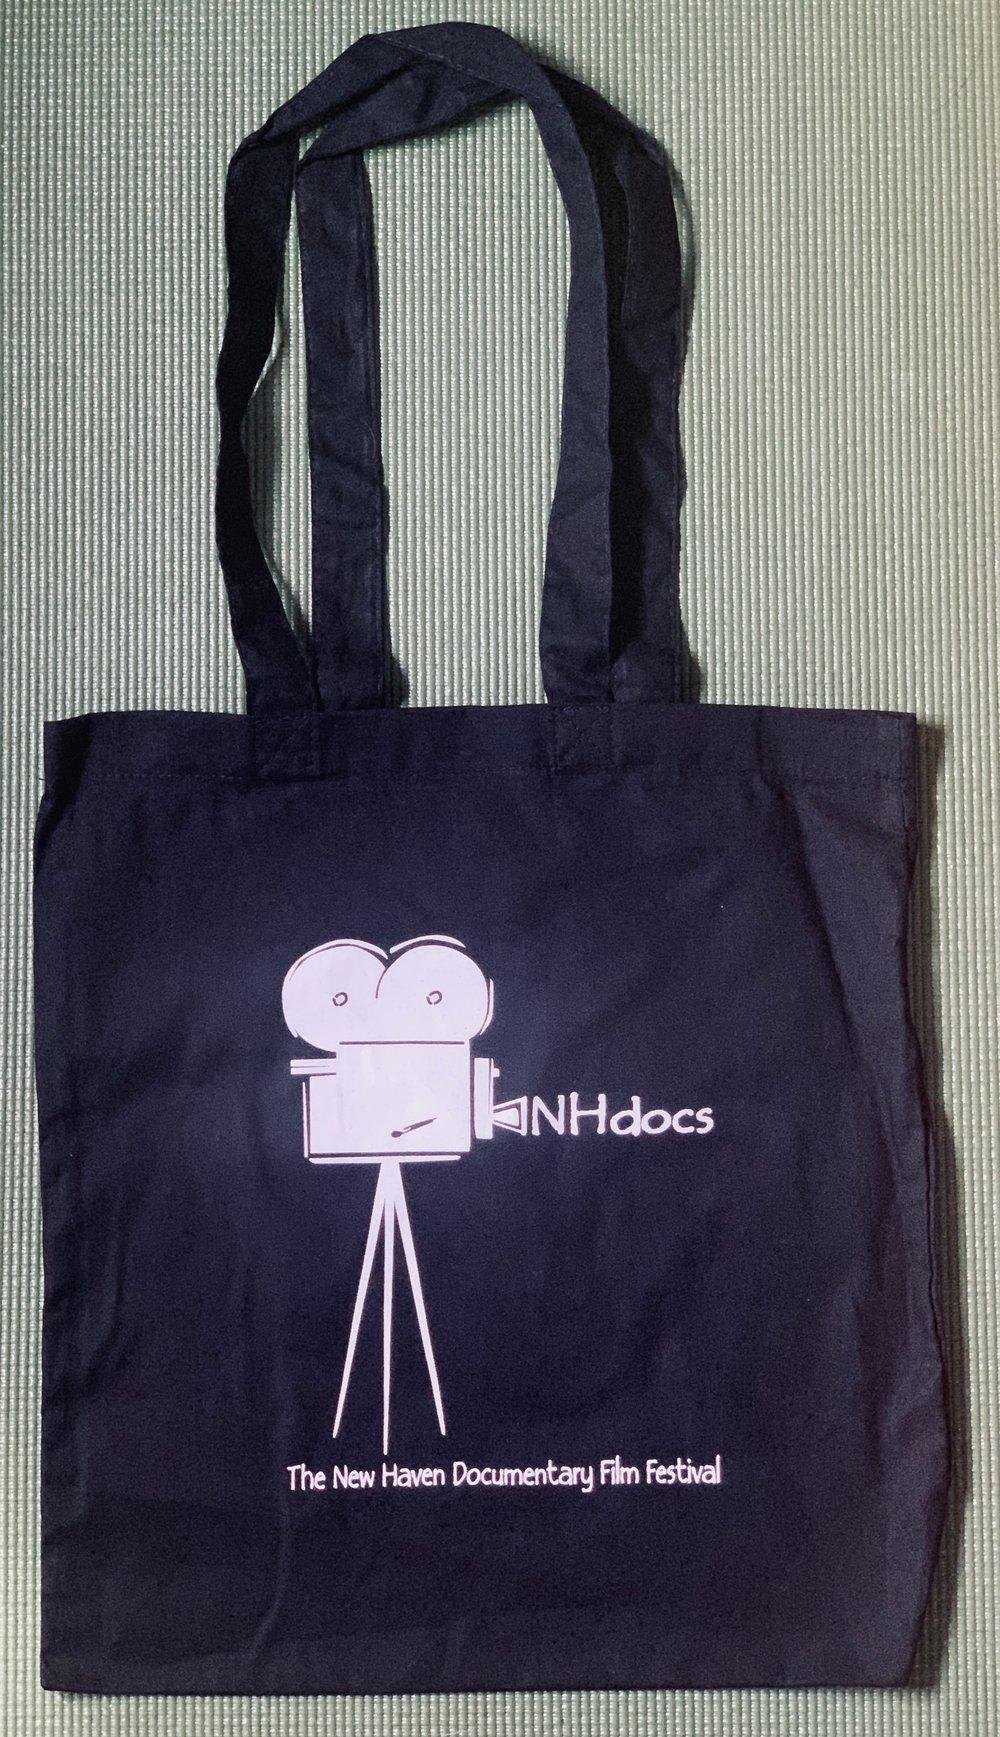 Image of NHdocs tote bag